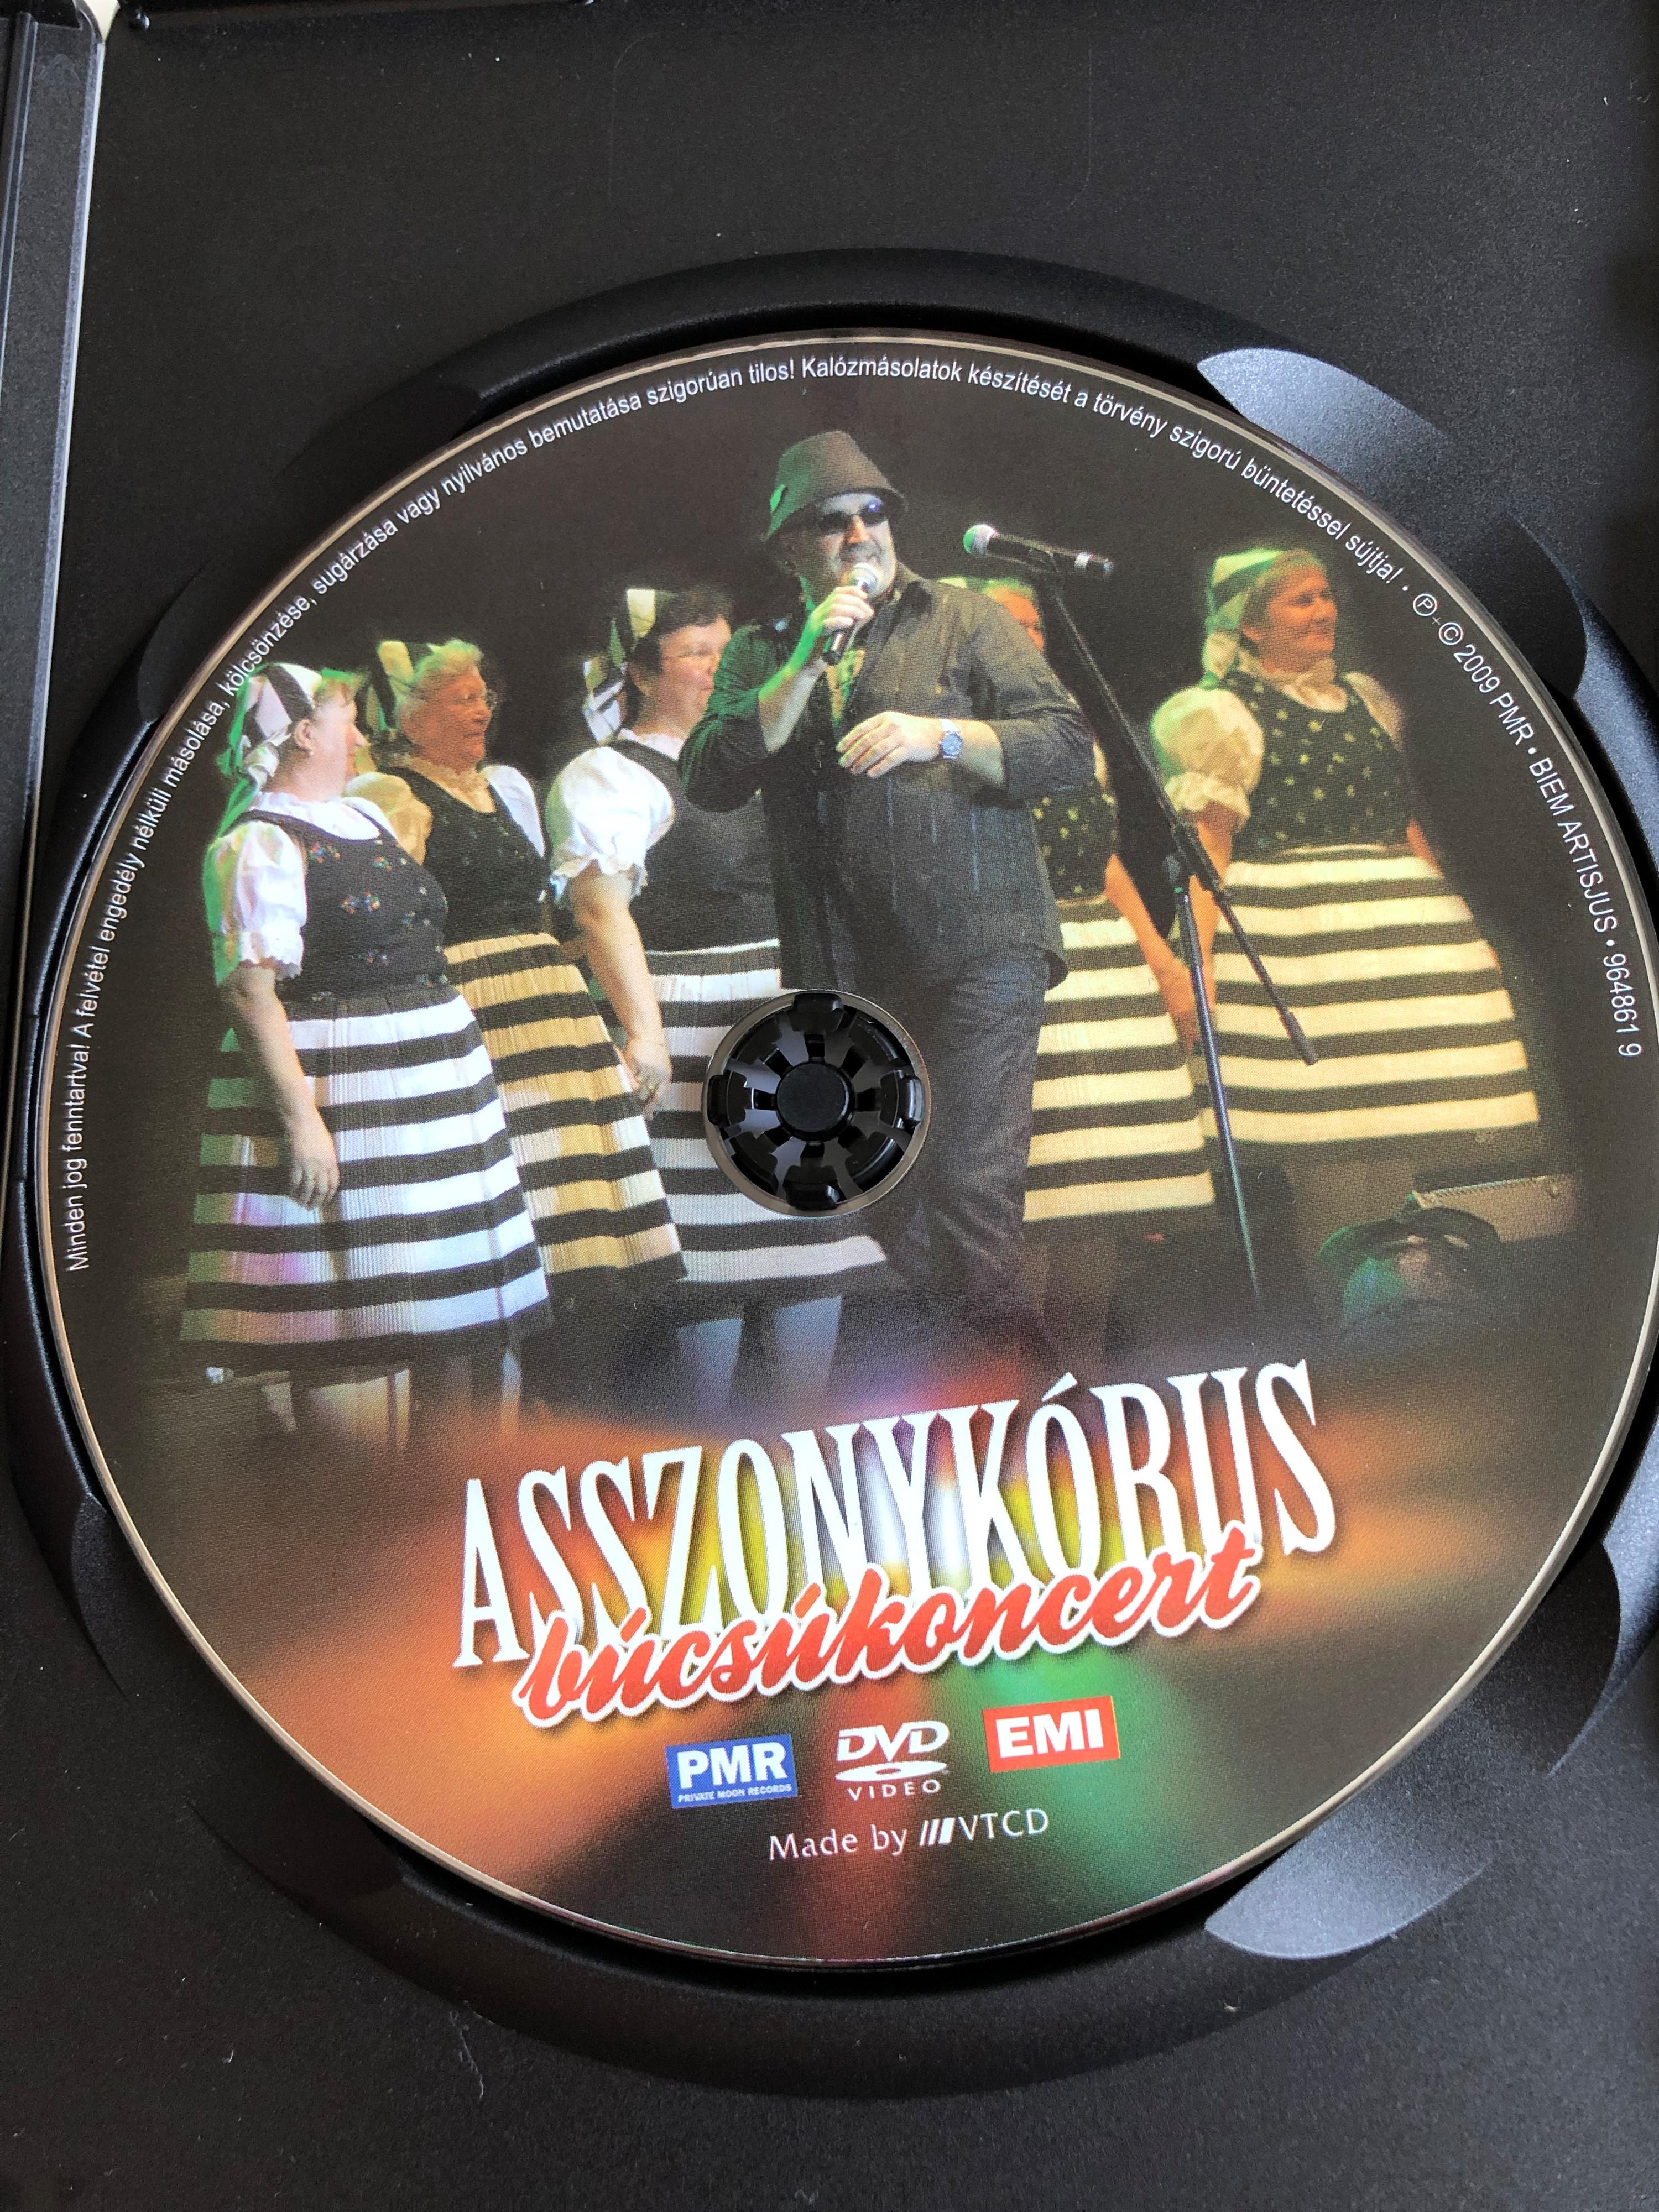 janics-k-istv-n-s-a-veresegyh-zi-asszonyk-rus-dvd-2009-b-cs-koncert-recorded-in-2008-in-pet-fi-hall-budapest-5-.jpg